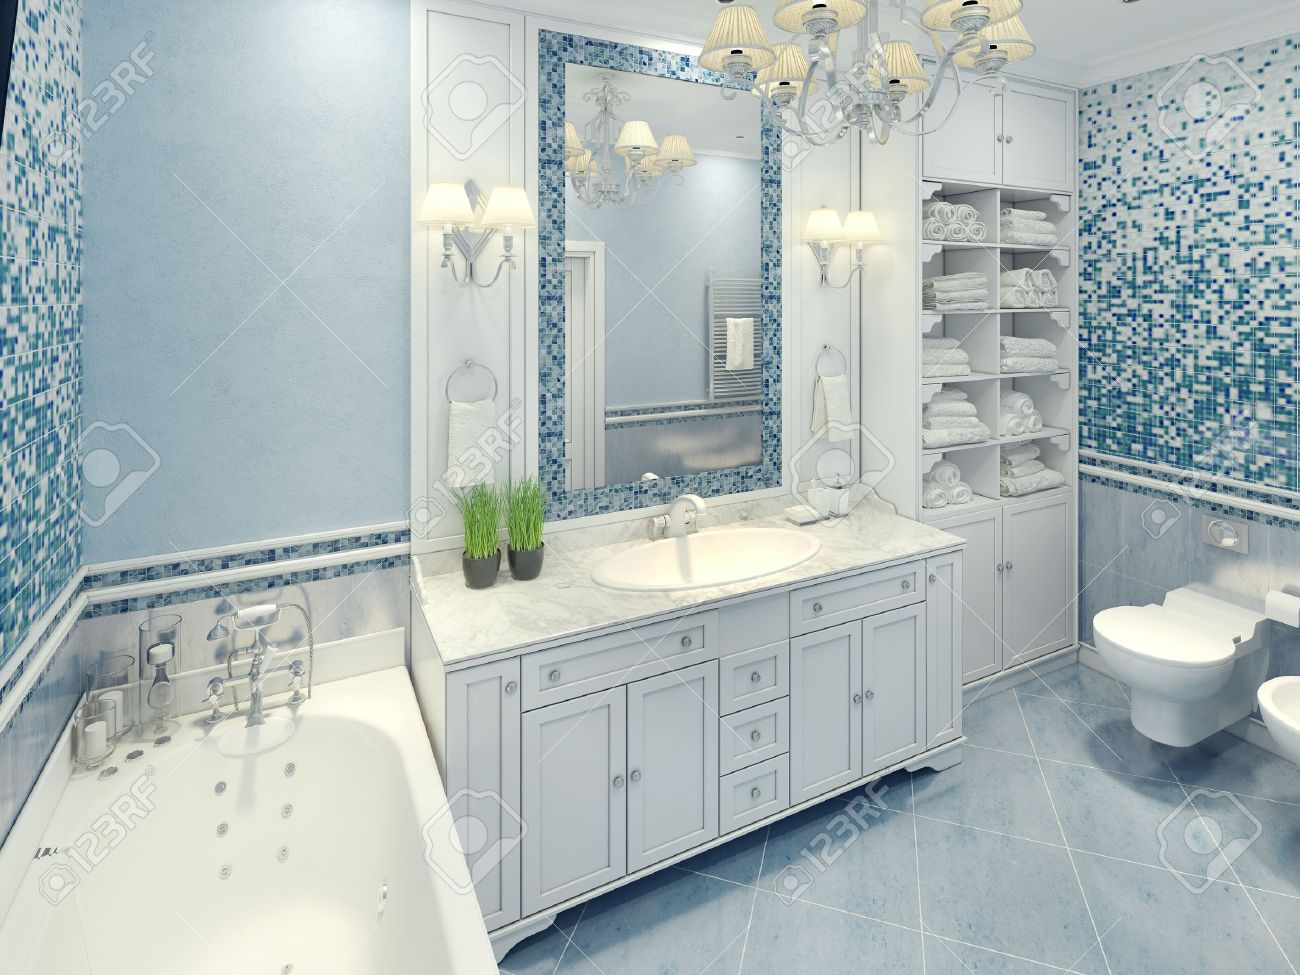 Bright art deco badkamer interieur. de ruime badkamer met witte